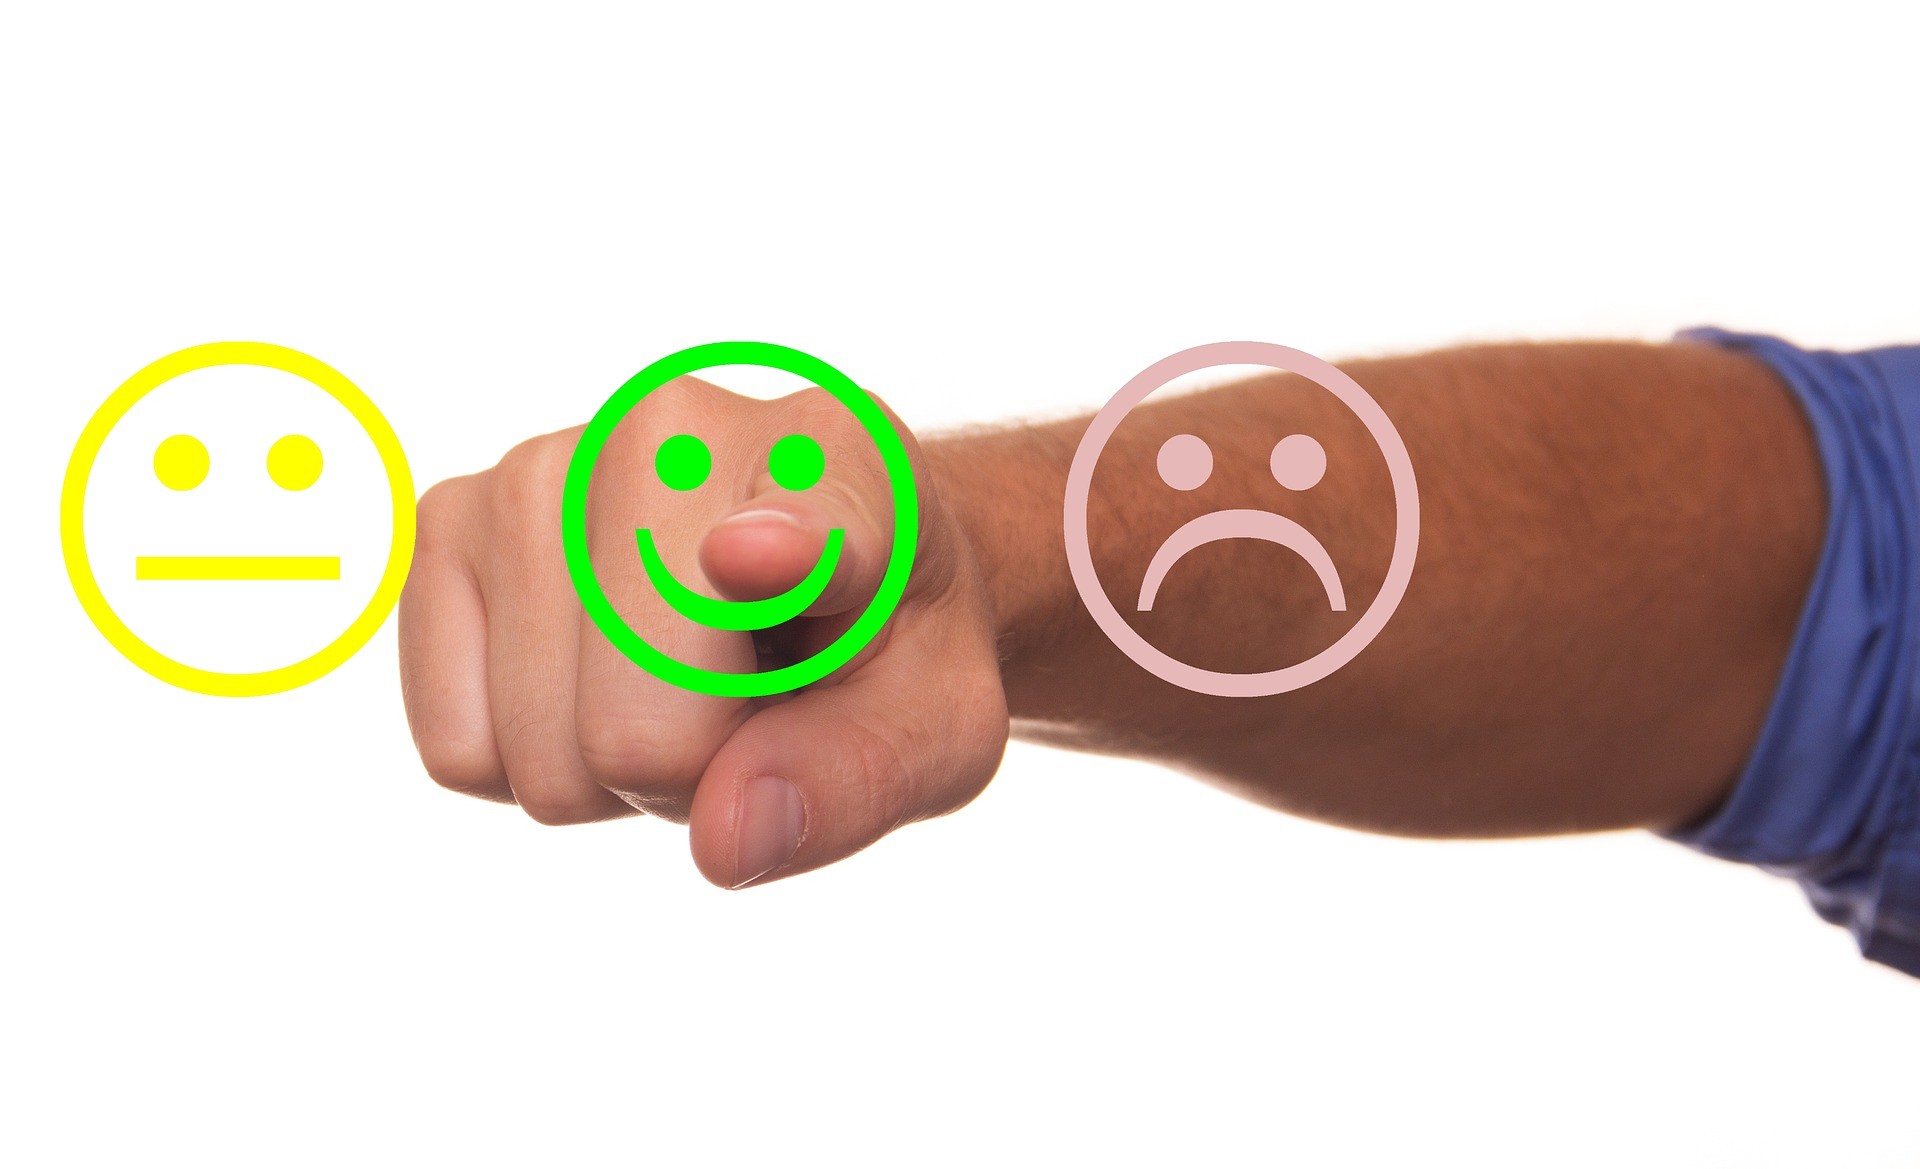 savunma Pazarlamada 5A Müşteri Yol Haritası (5. Aşama Savunma) mutlu musteri